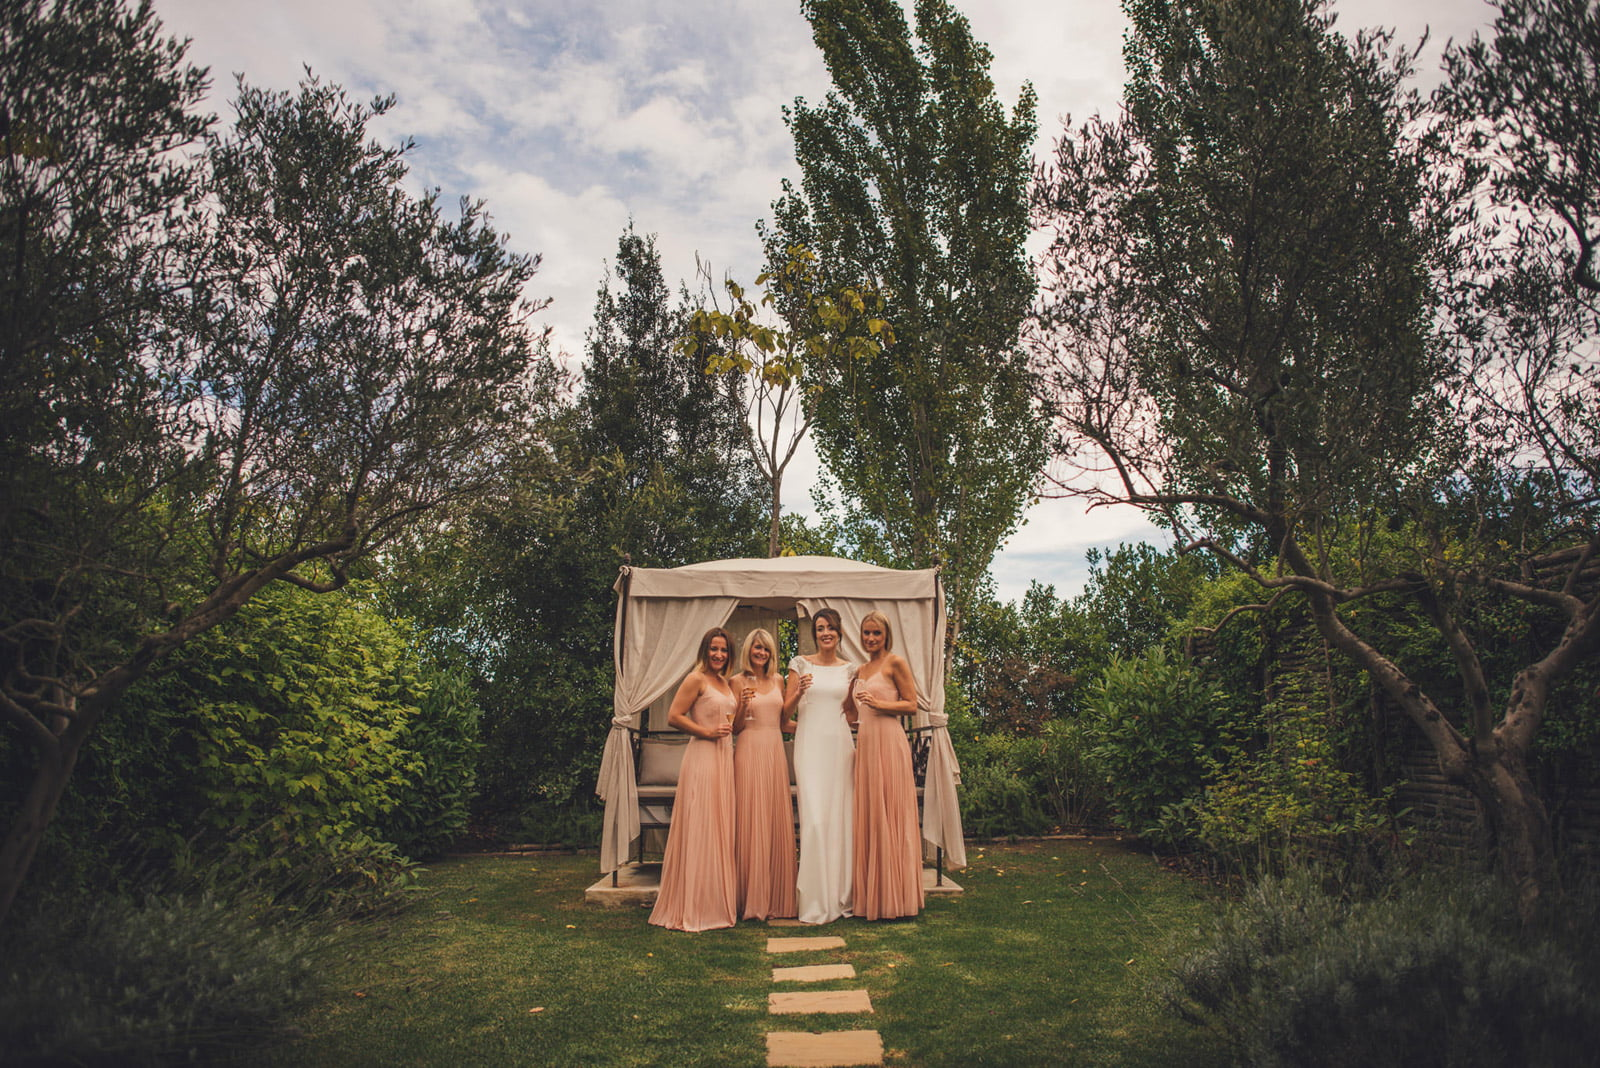 028-wedding-tuscany-san-galgano-federico-pannacci-photographer